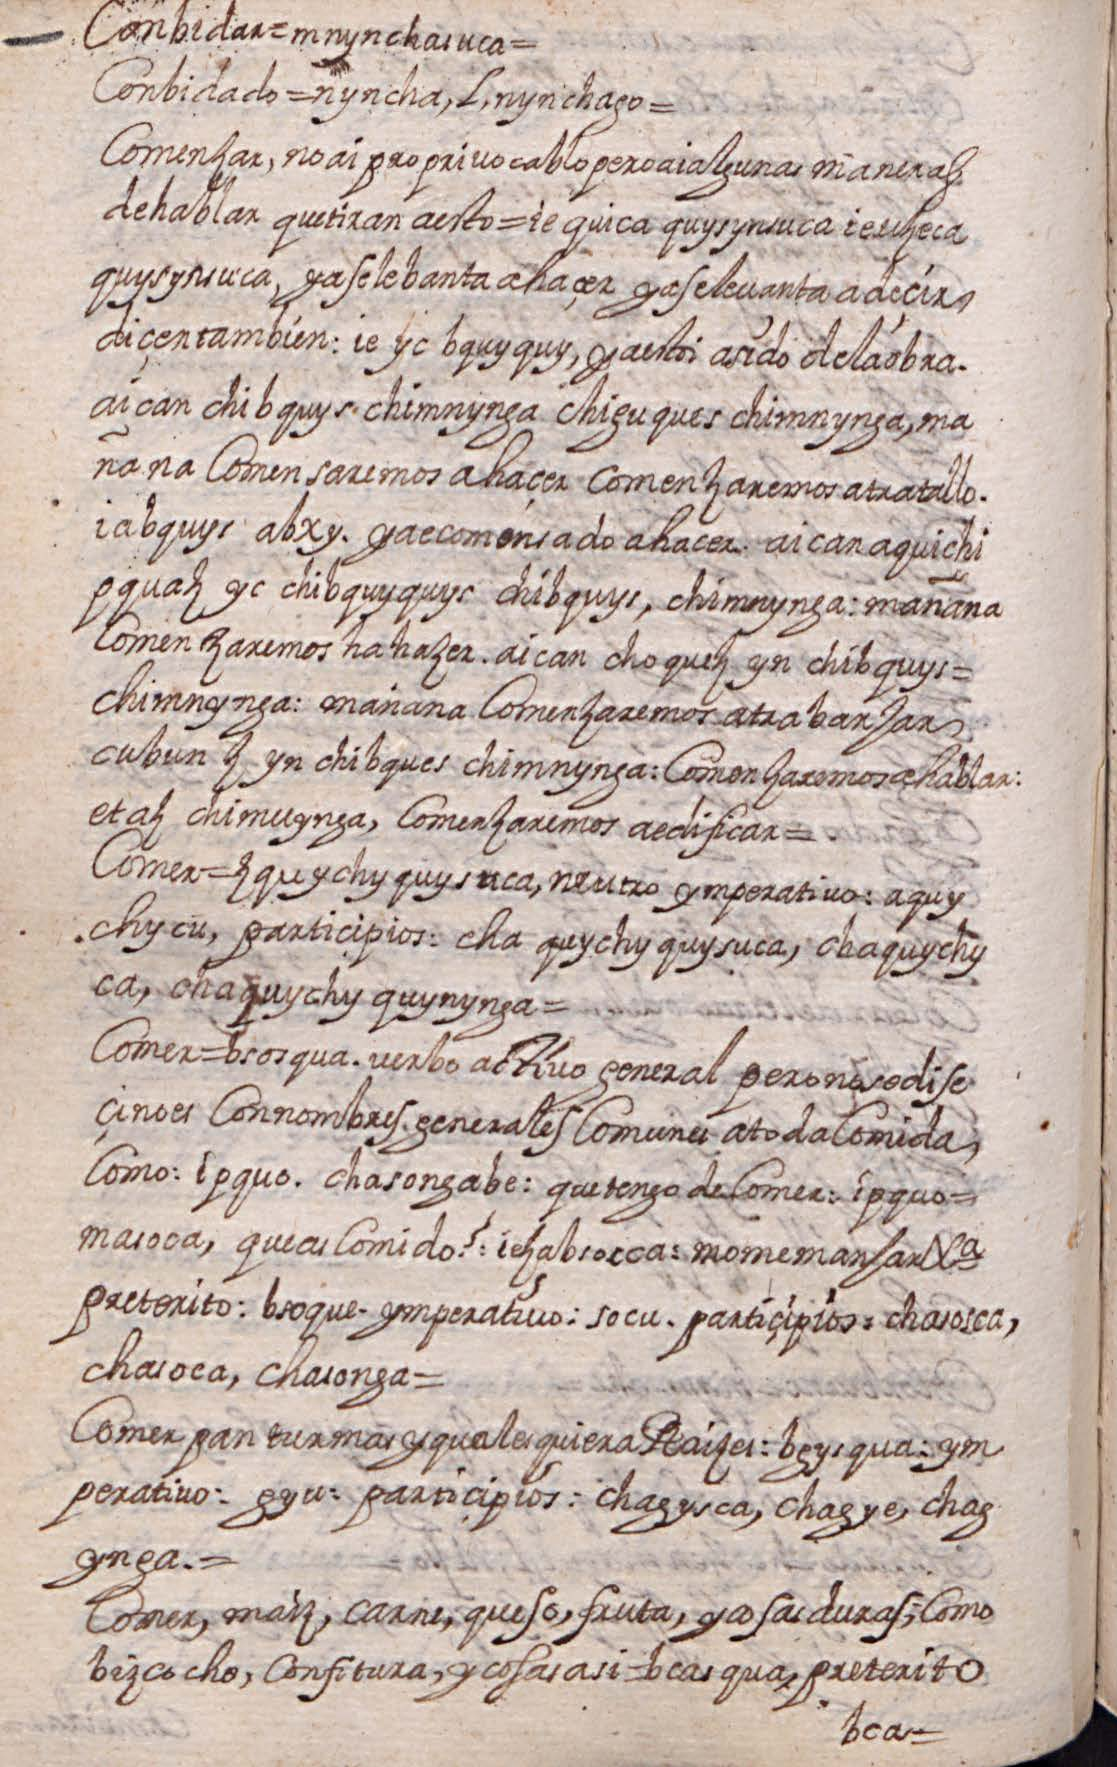 Manuscrito 158 BNC Vocabulario - fol 40v.jpg